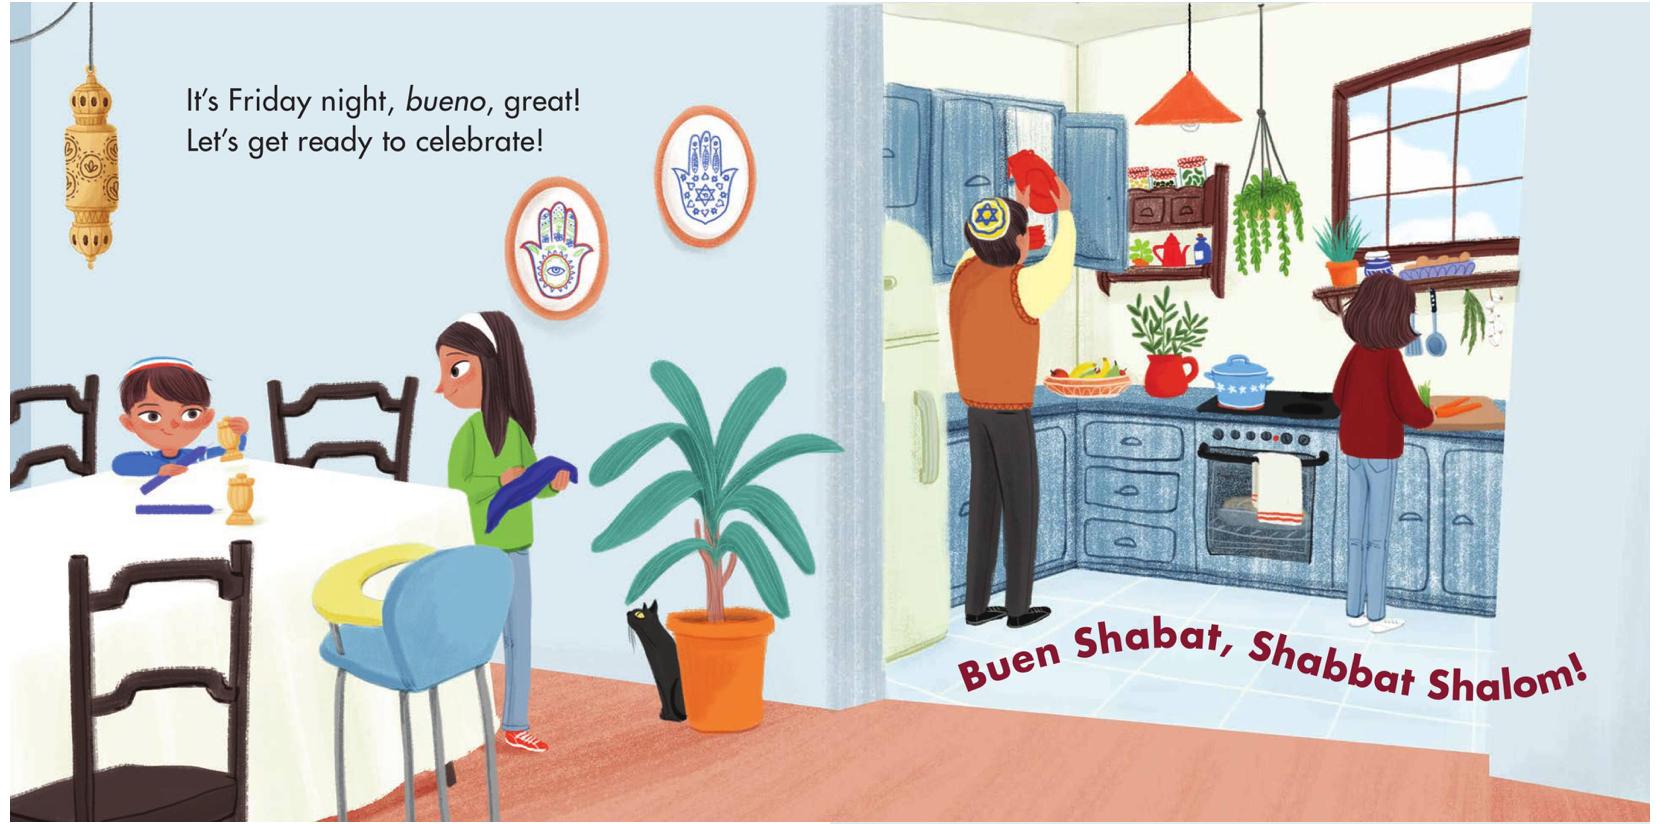 Buen Shabbat page